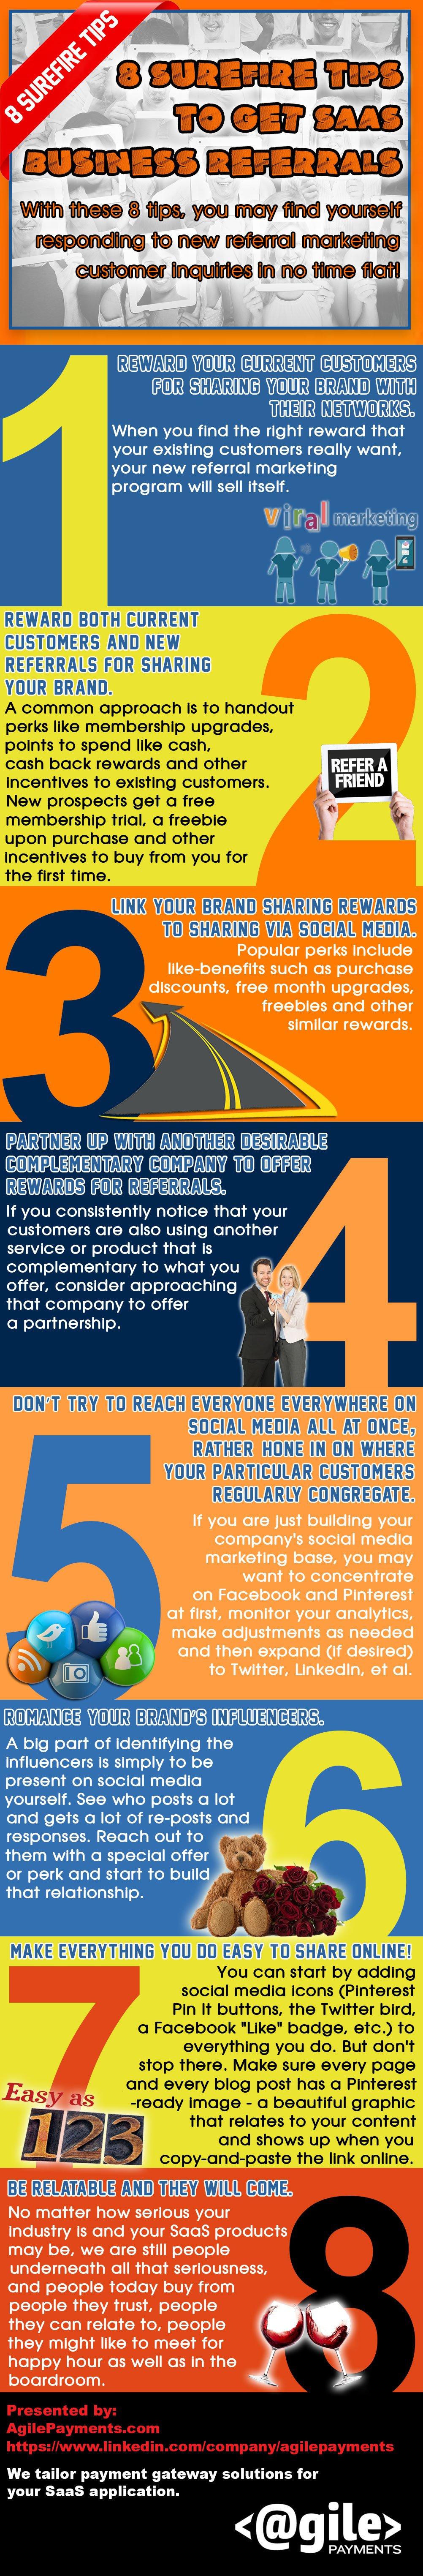 8-surefire-referral methods infographic